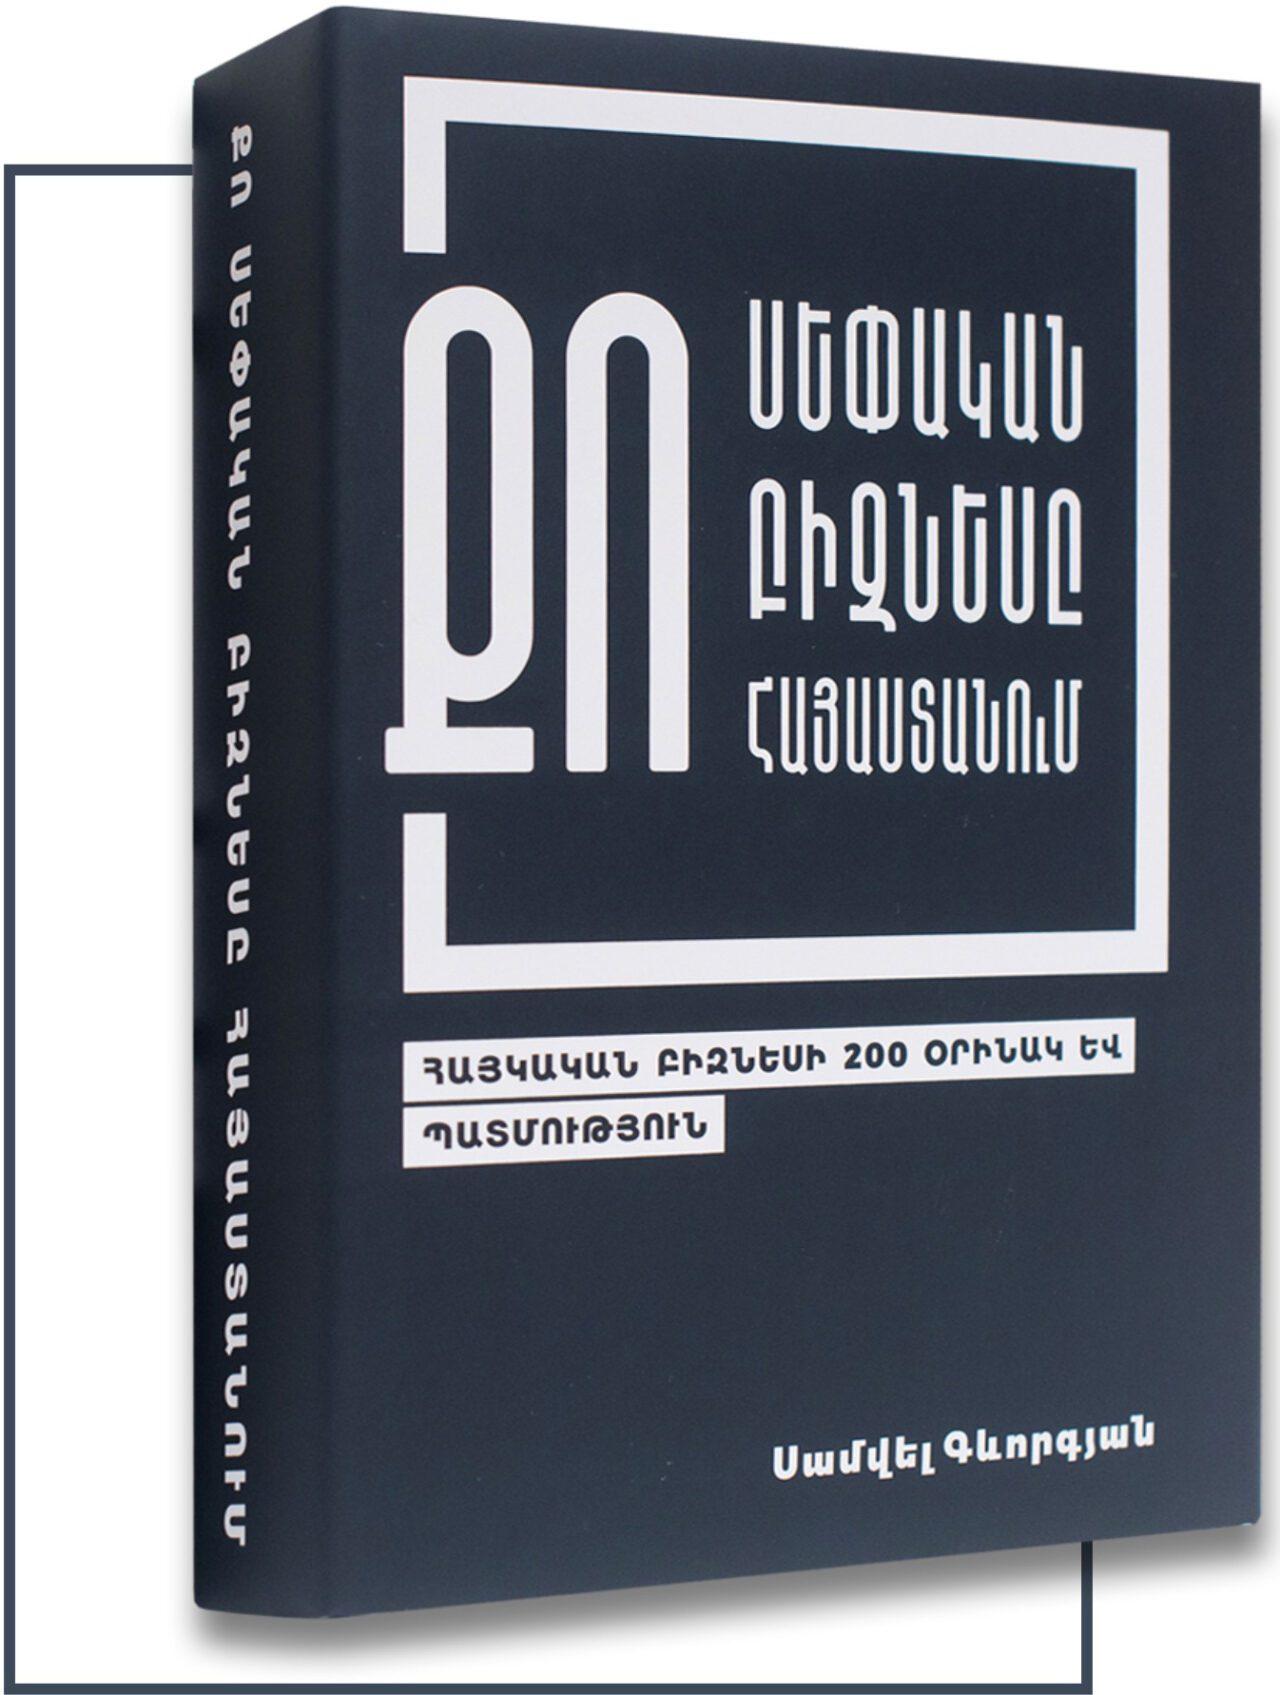 https://samvelgevorgyan.com/wp-content/uploads/2021/04/Book-YOBIA-1280x1695.jpg